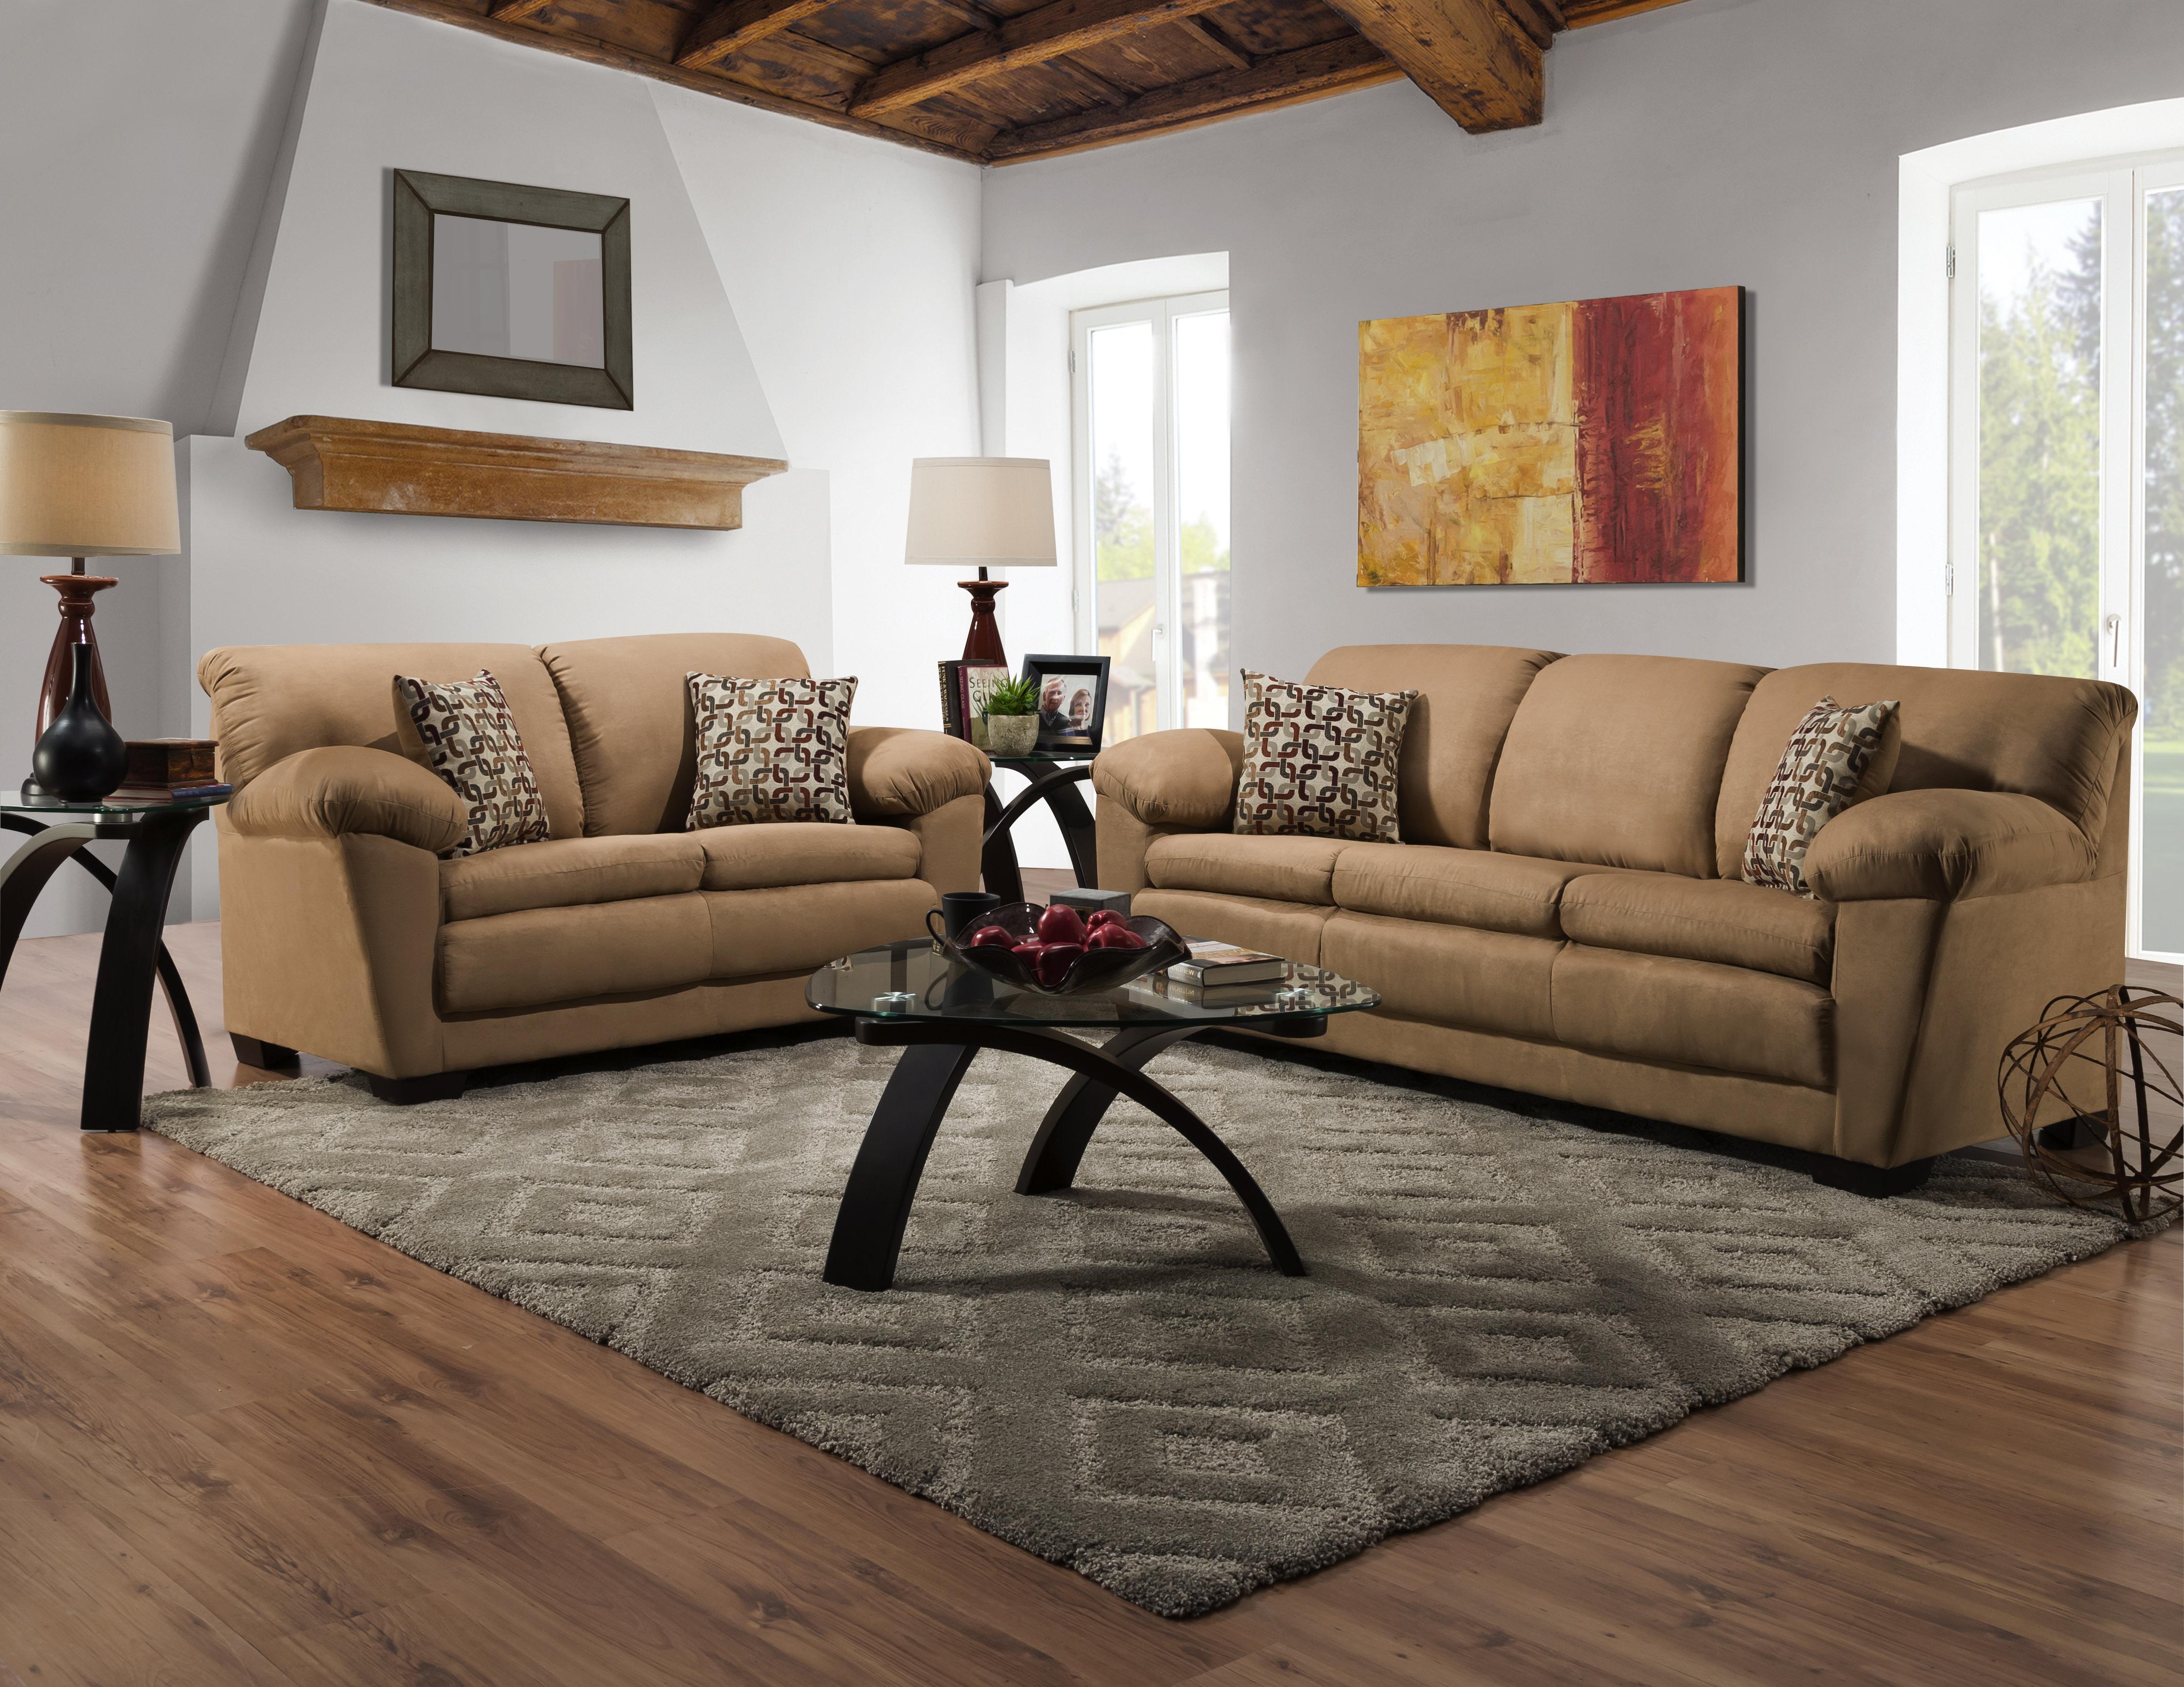 Adobe Camel Sofa